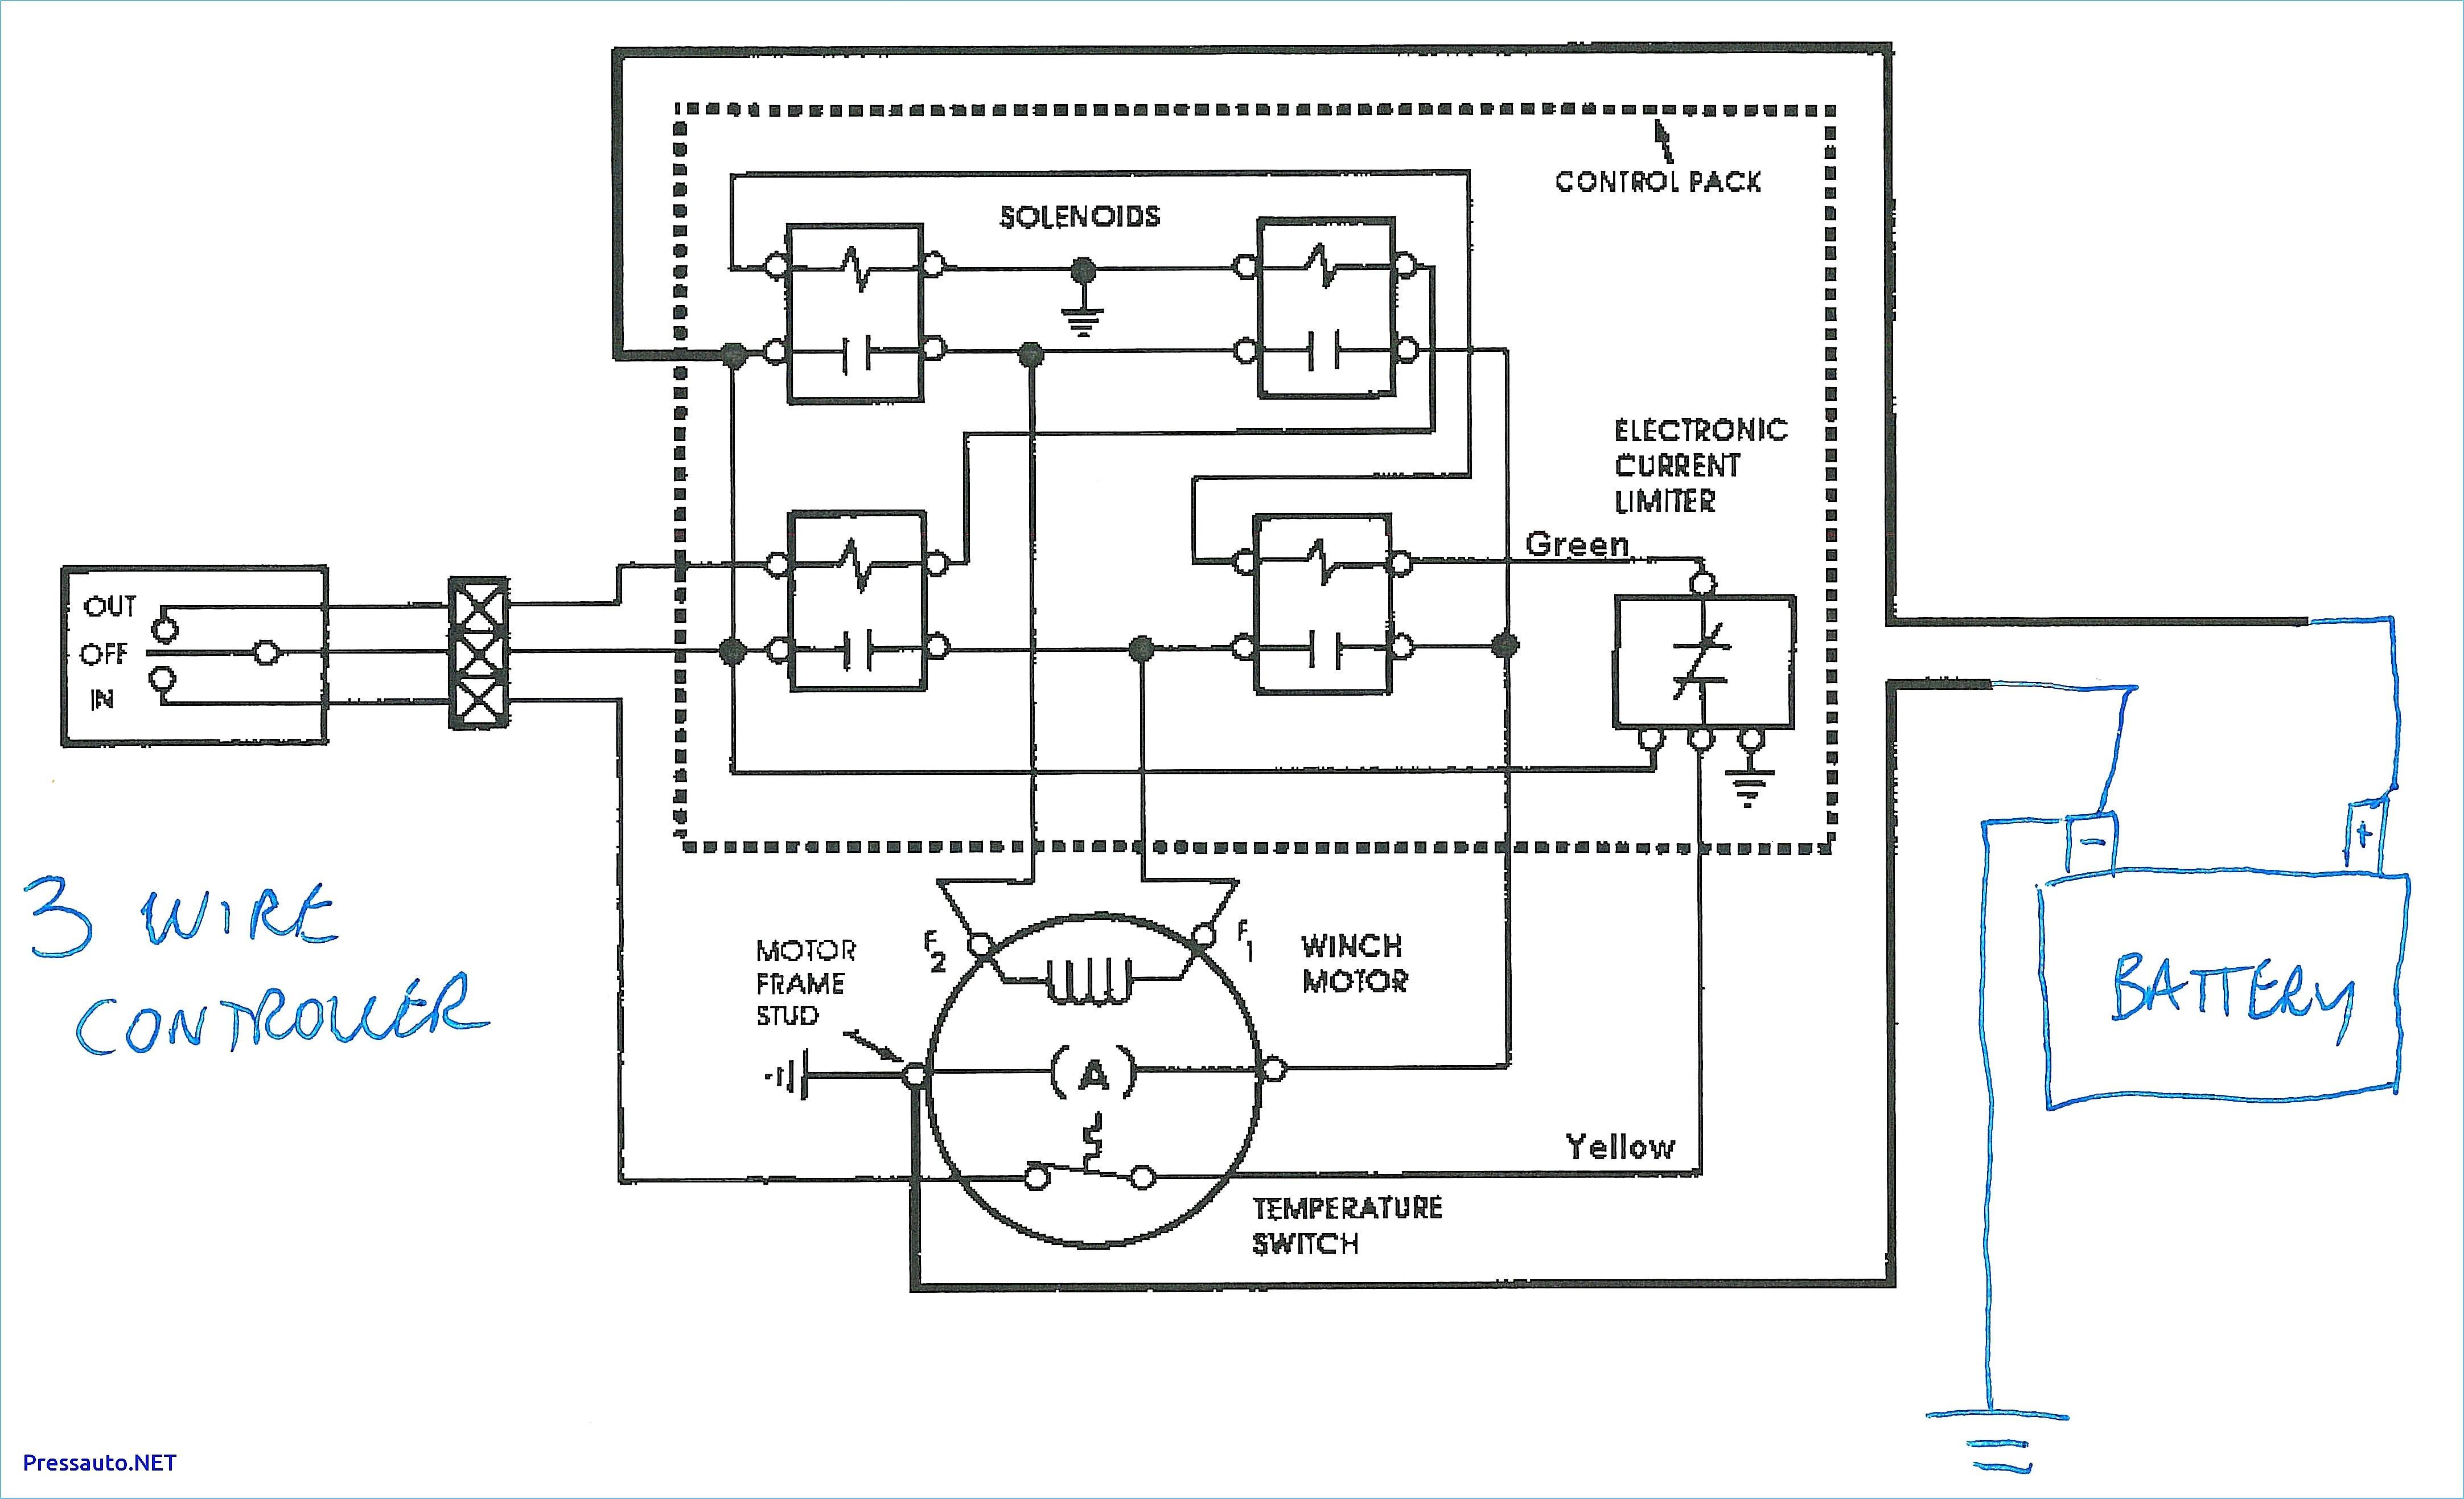 Septic Tank Float Switch Wiring Diagram Fresh Champion Pump Wiring - Septic Tank Float Switch Wiring Diagram